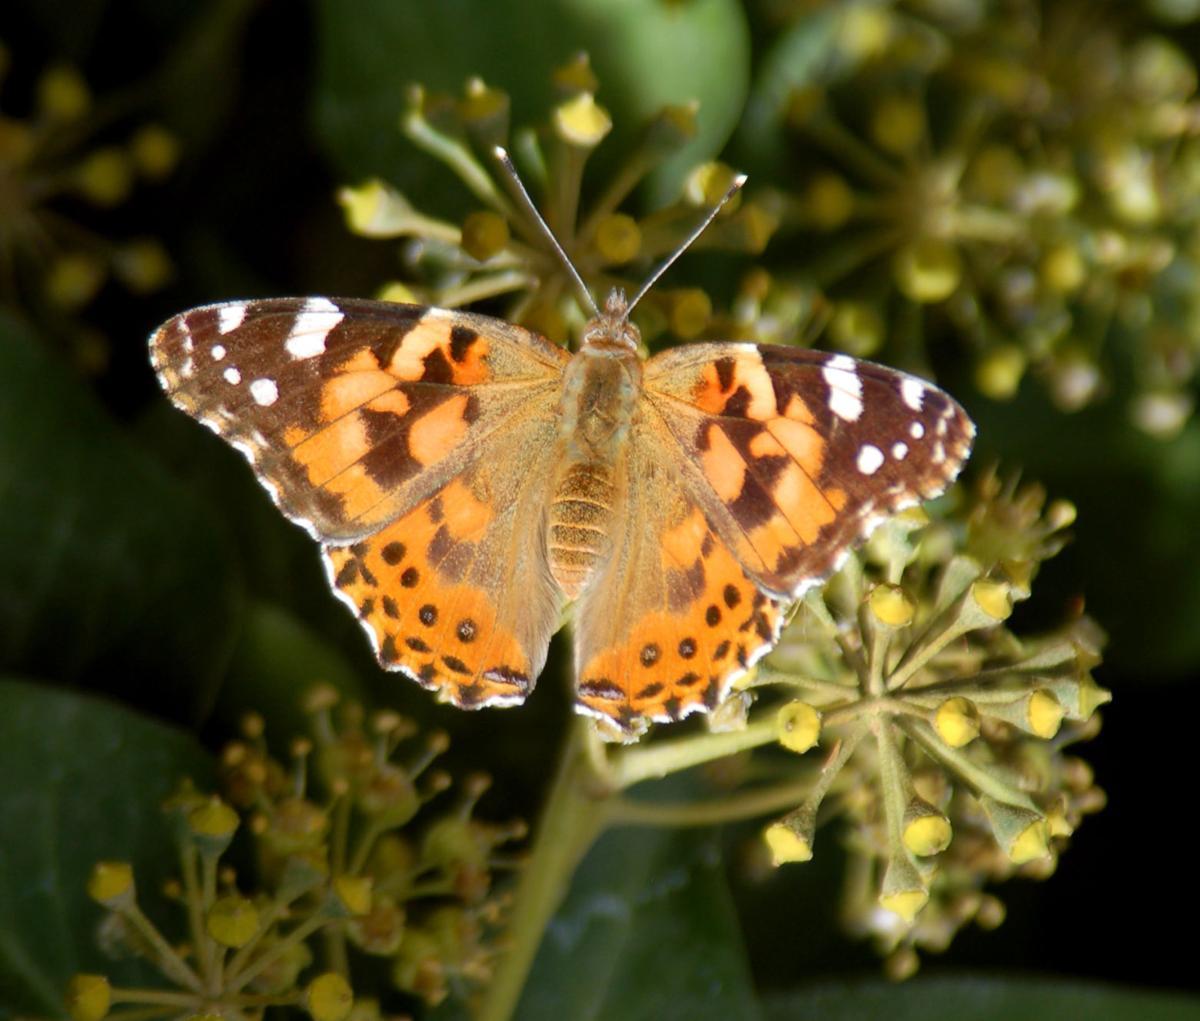 Pen in Hand #1496 - Butterflies on the Move 1.jpg